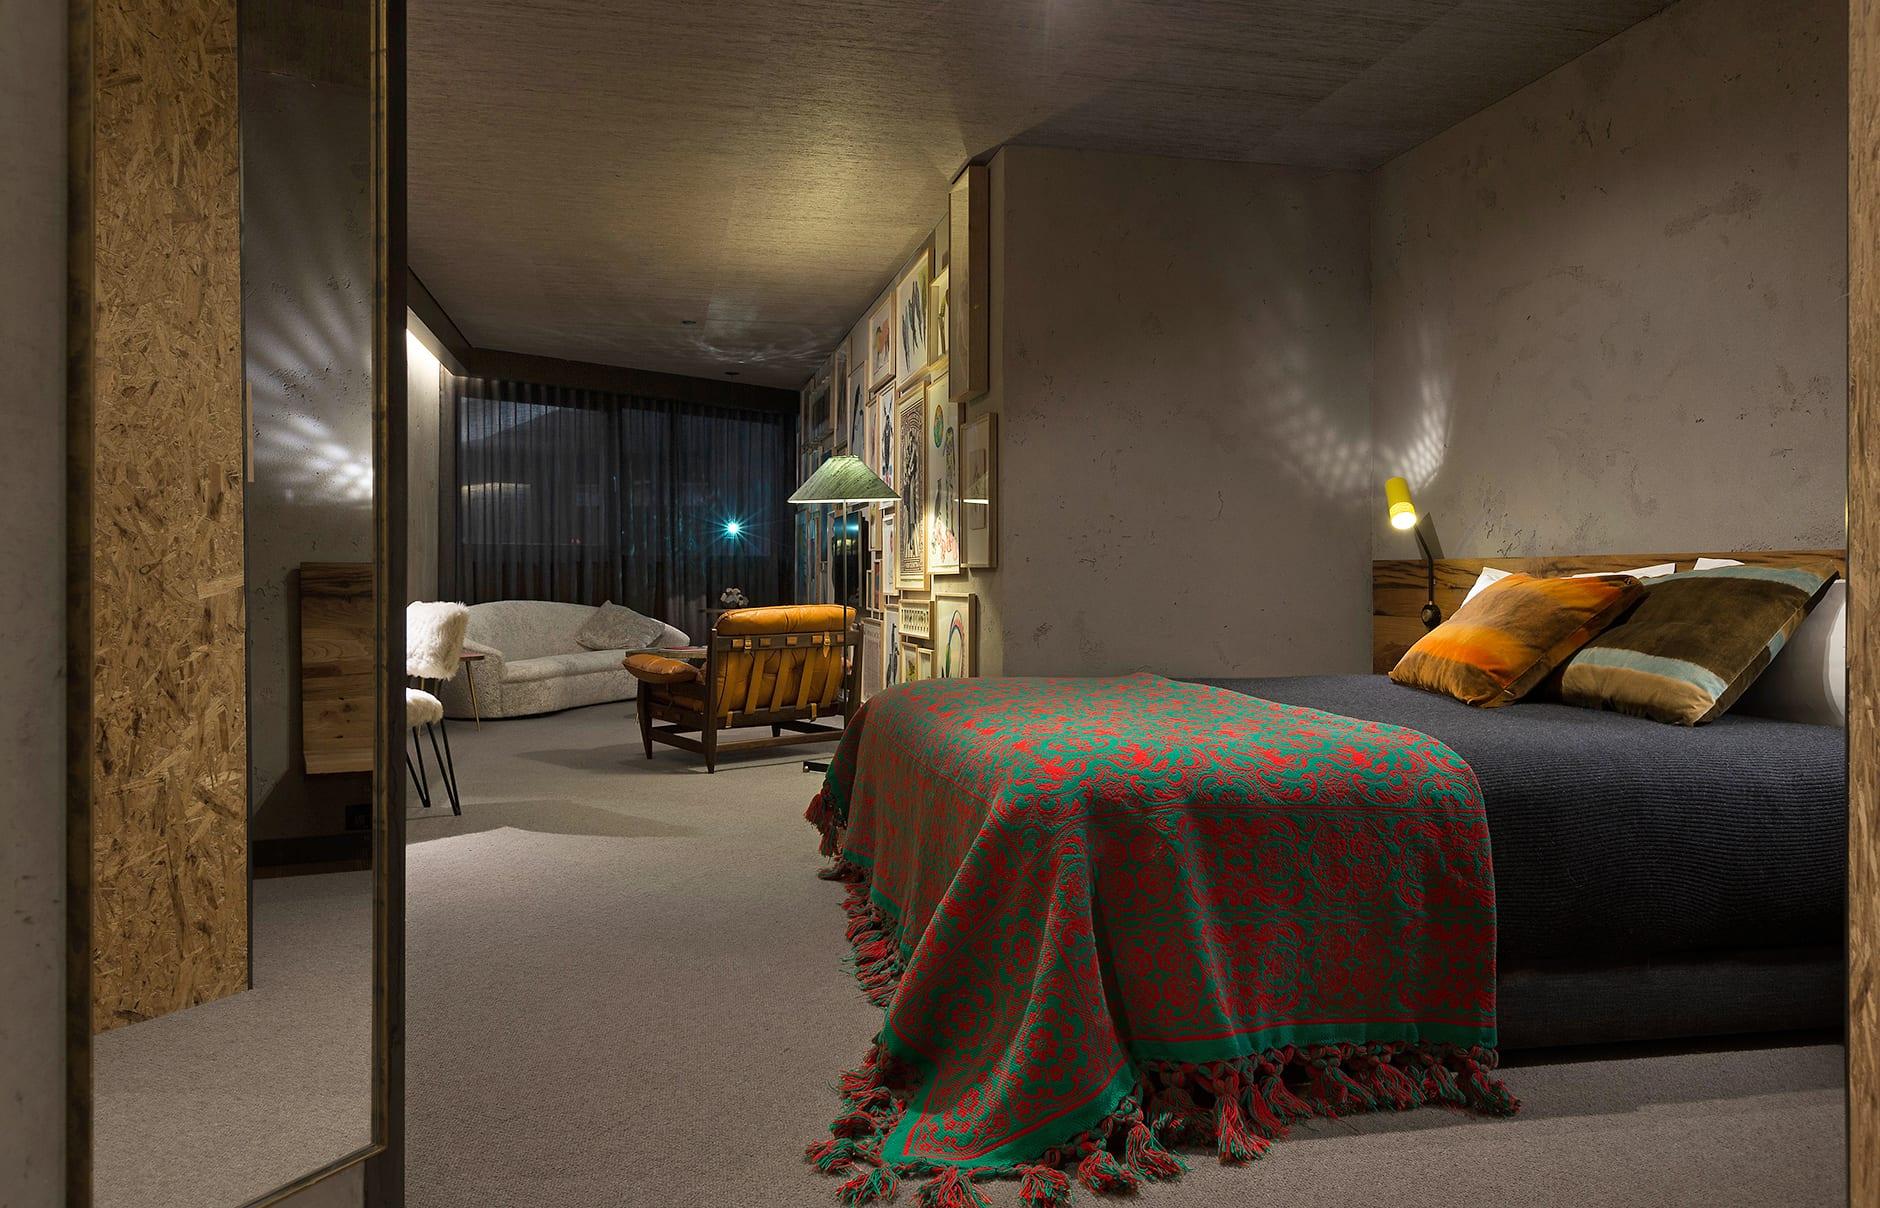 Hotel Hotel, Canberra, Australia. © Hotel Hotel